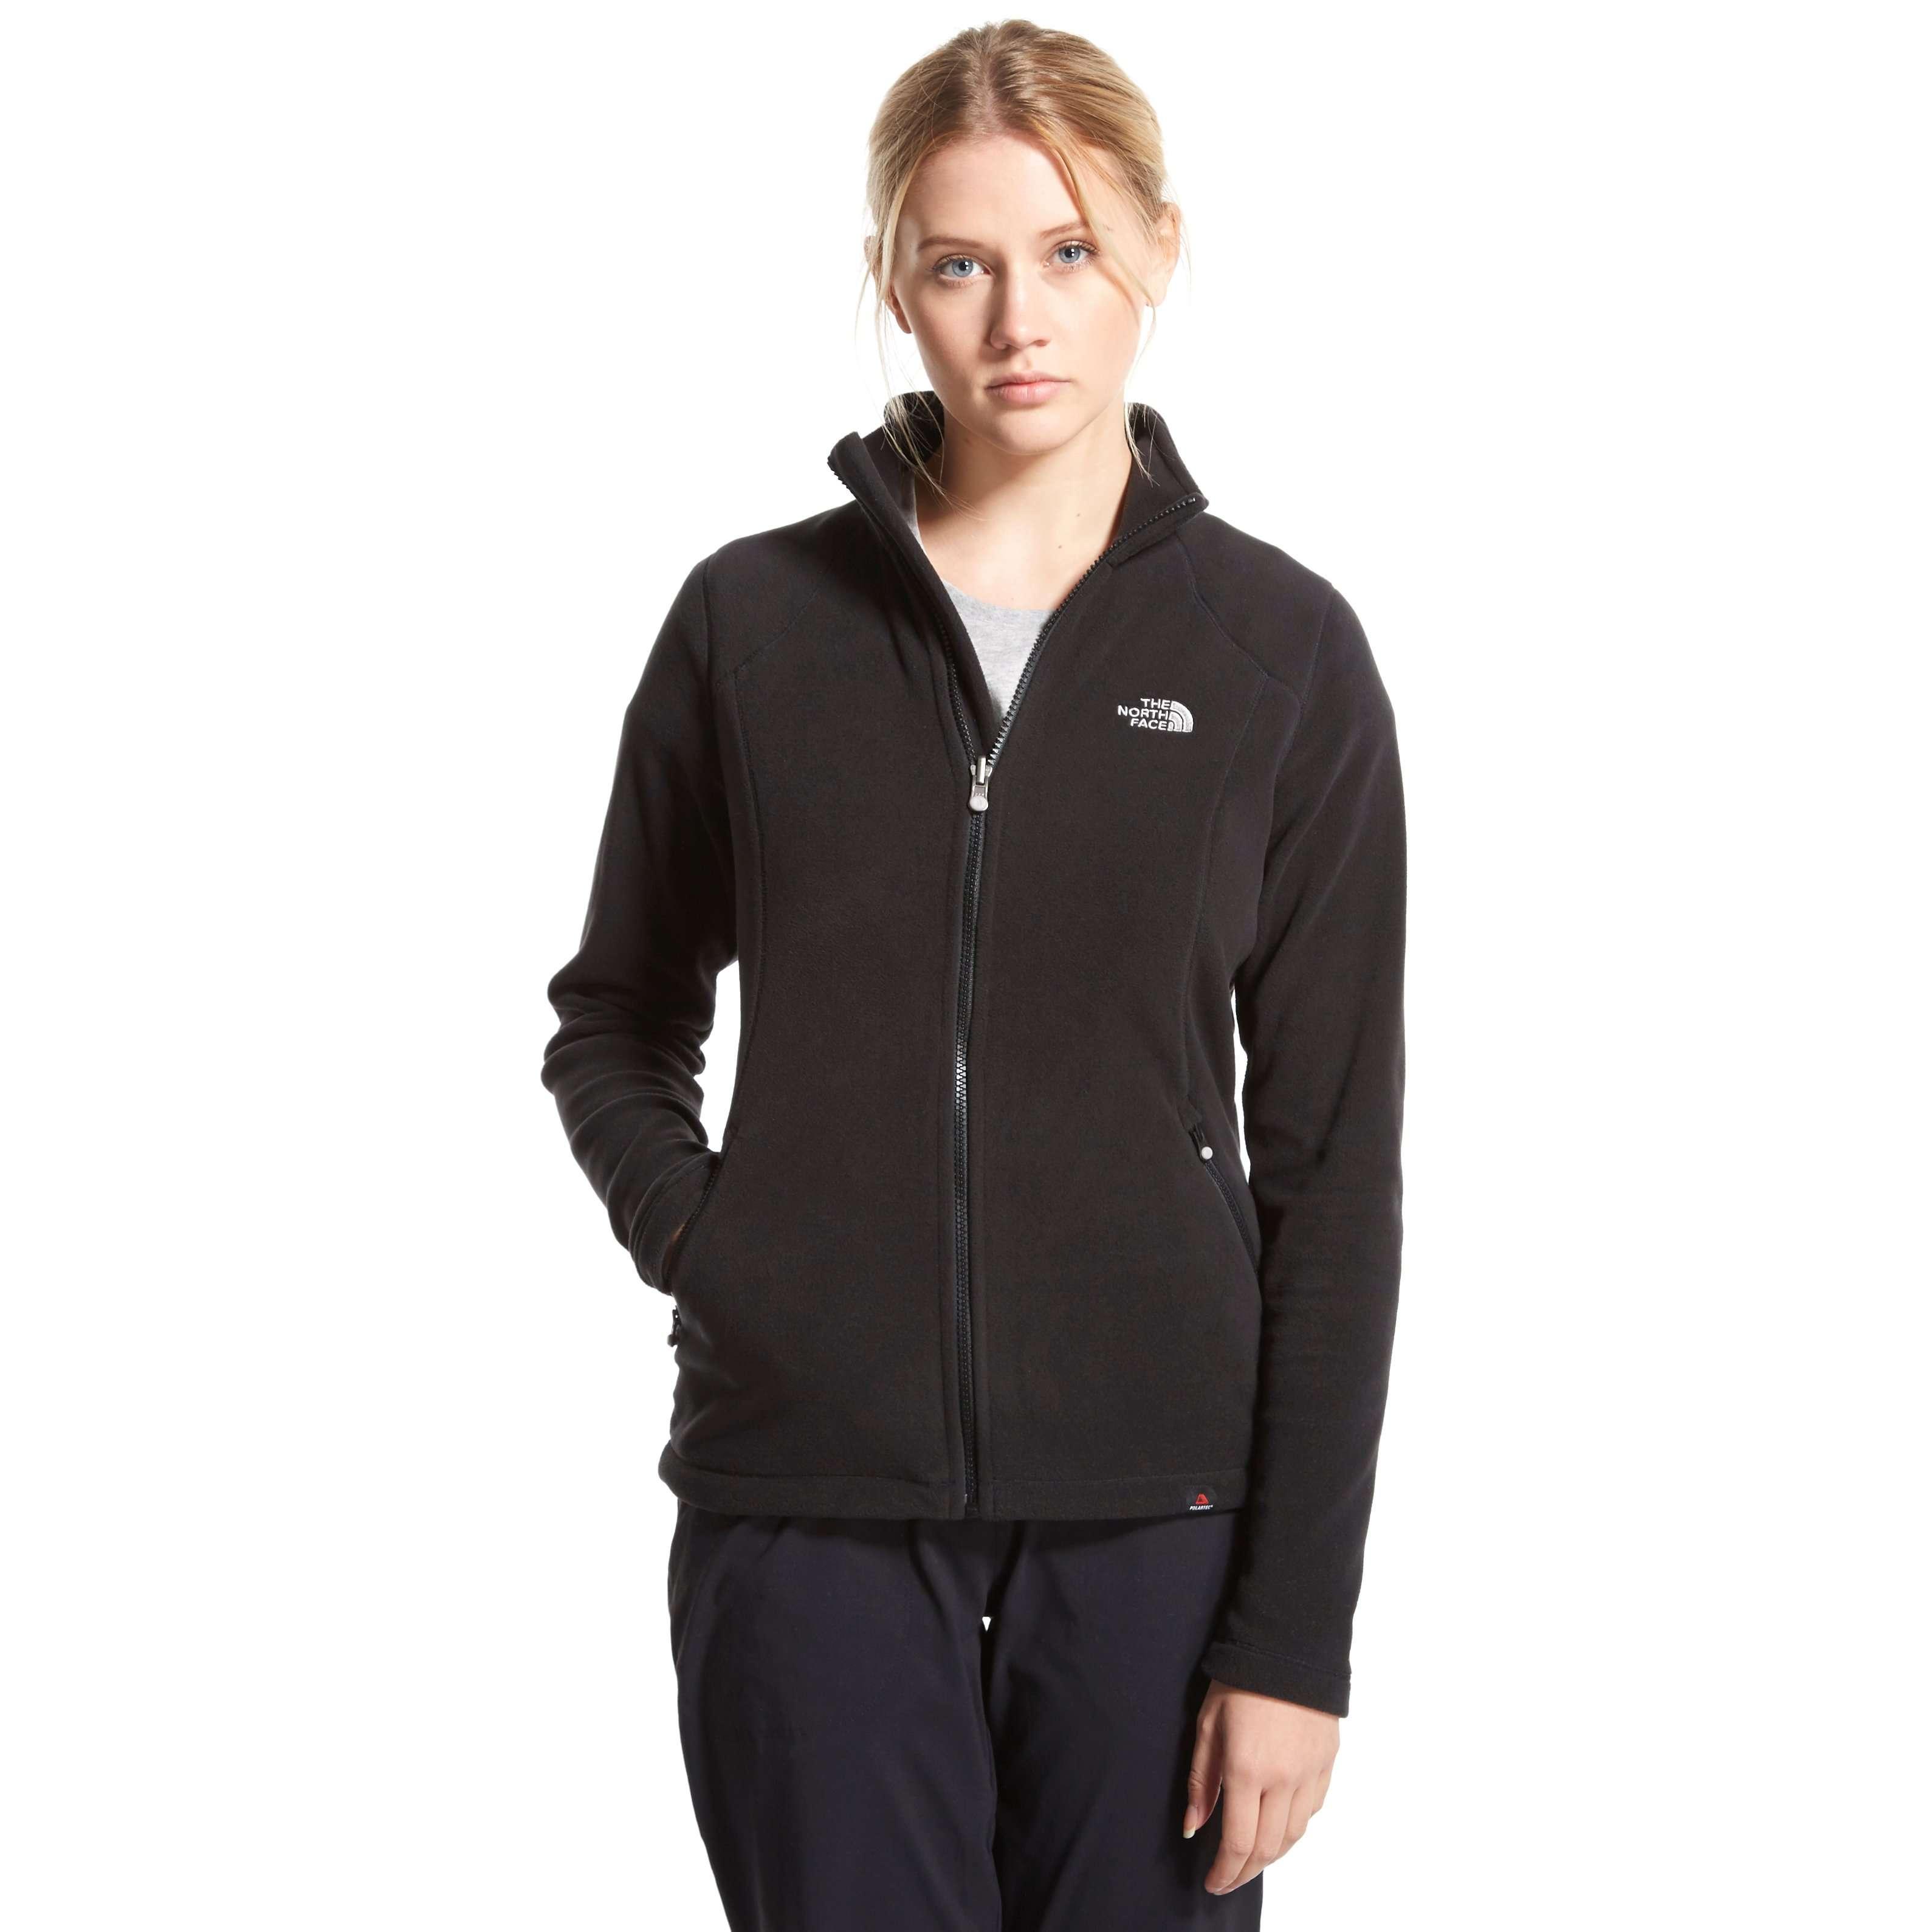 THE NORTH FACE Women's 100 Glacier Full Zip Polartec® Fleece ...